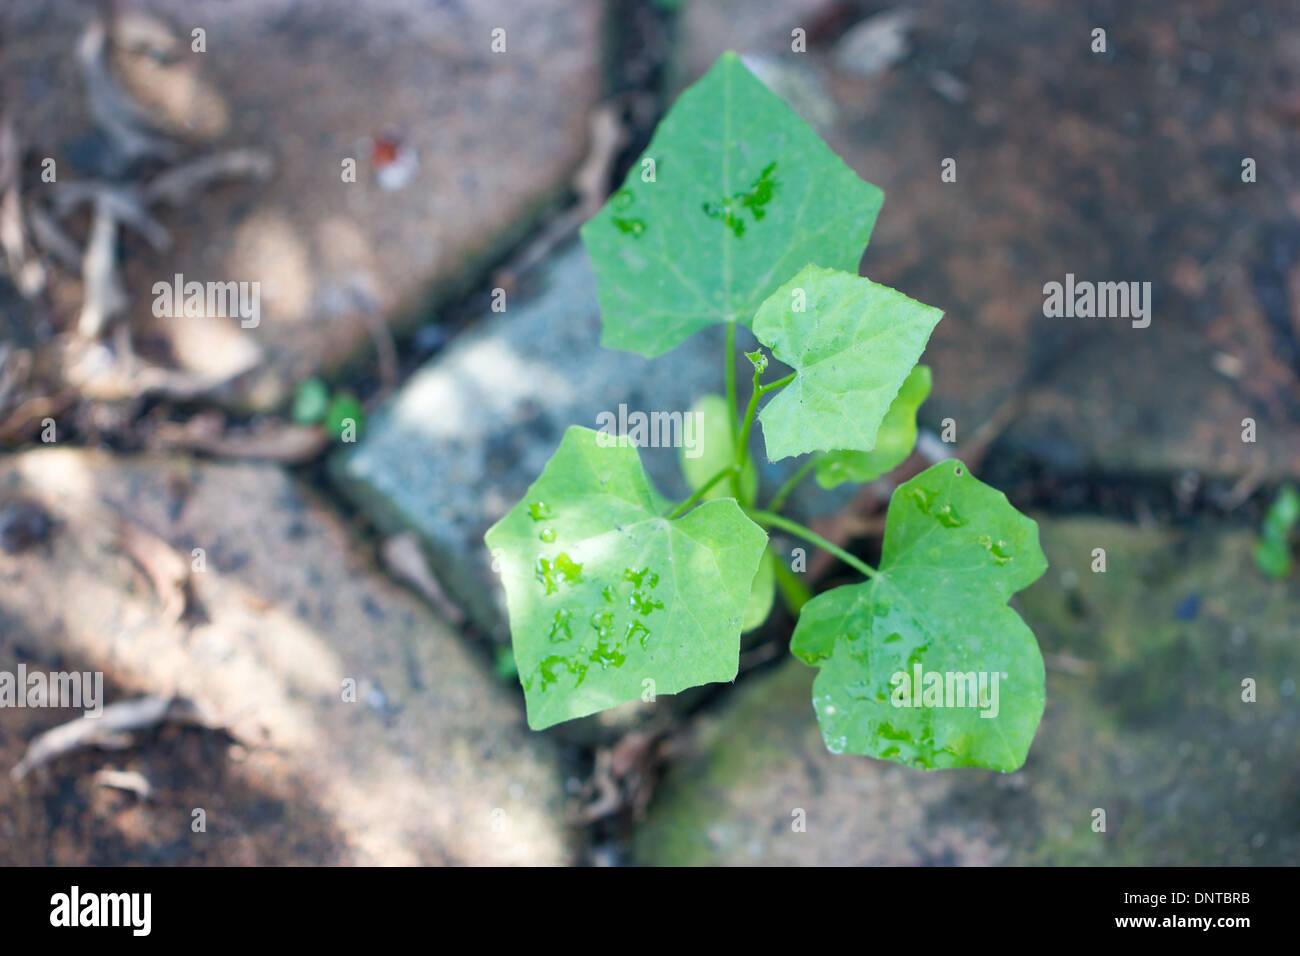 Junge Efeu Kurbis Pflanze Stockfoto Bild 65075007 Alamy